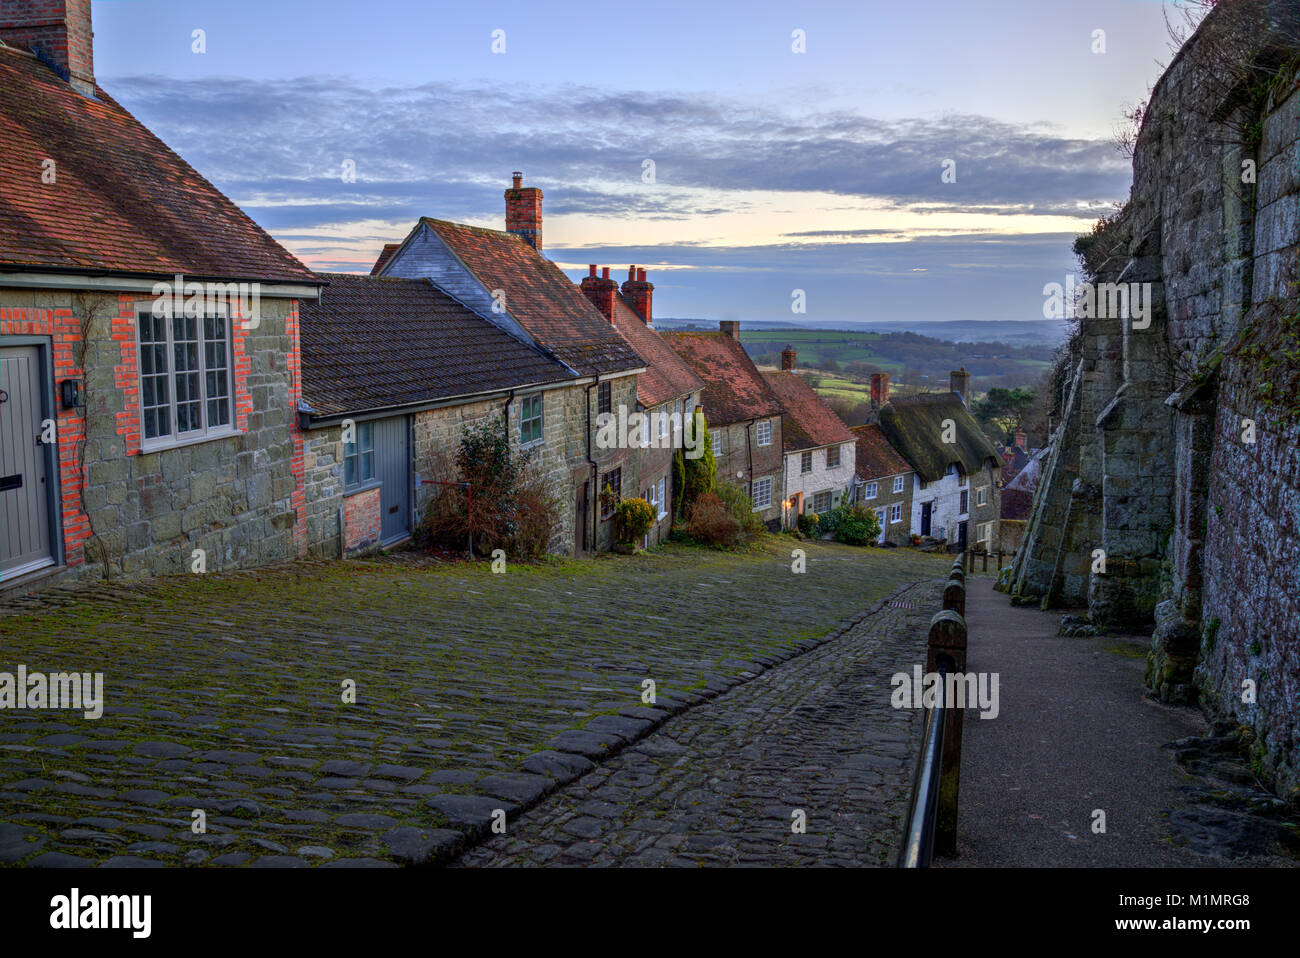 Shaftesbury, Gold Hill, Dorset, England, United Kingdom Stock Photo